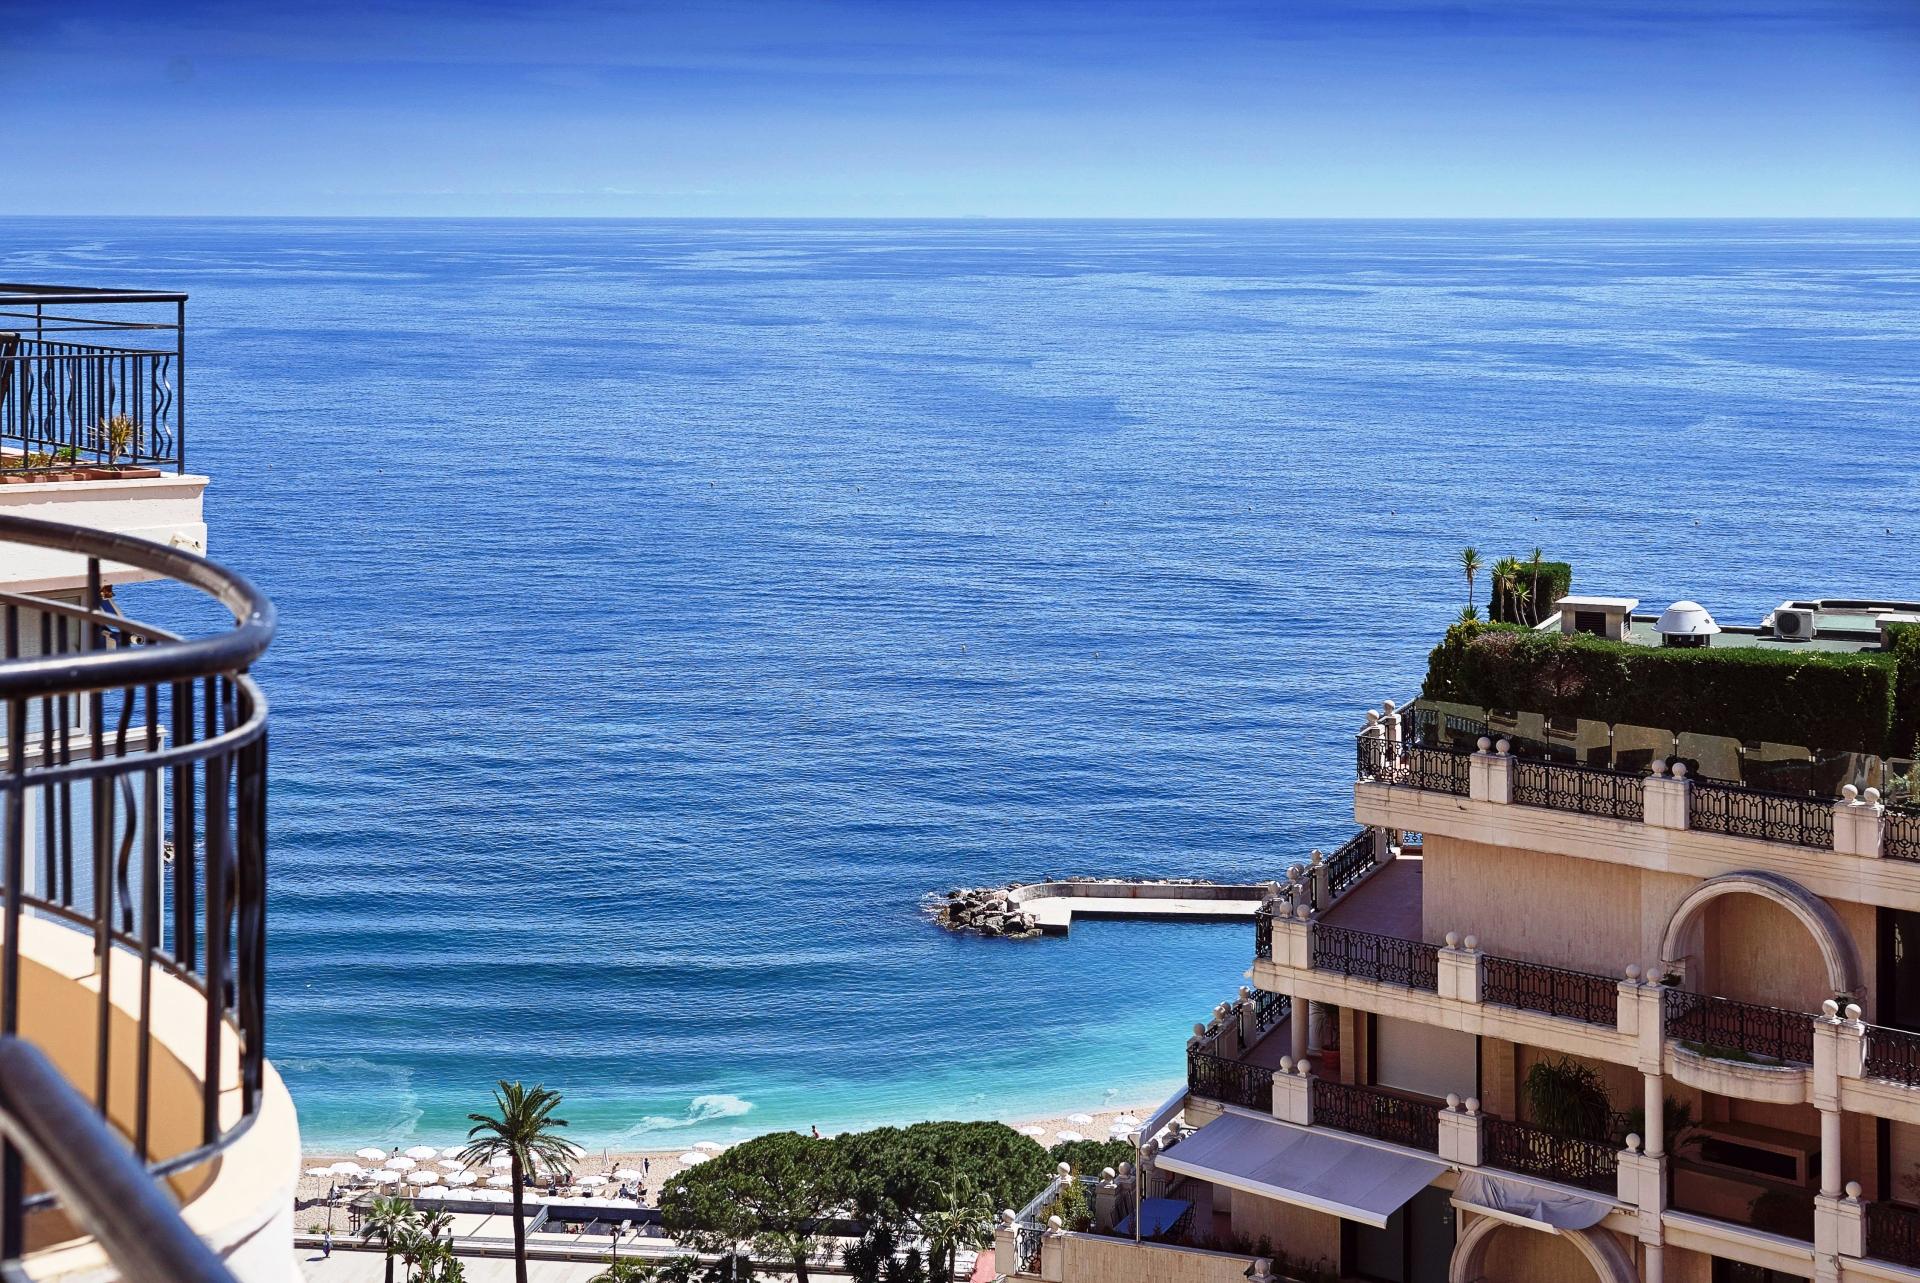 Vente penthouse avec grande toit terrasse vue mer for Toit terrasse immobilier